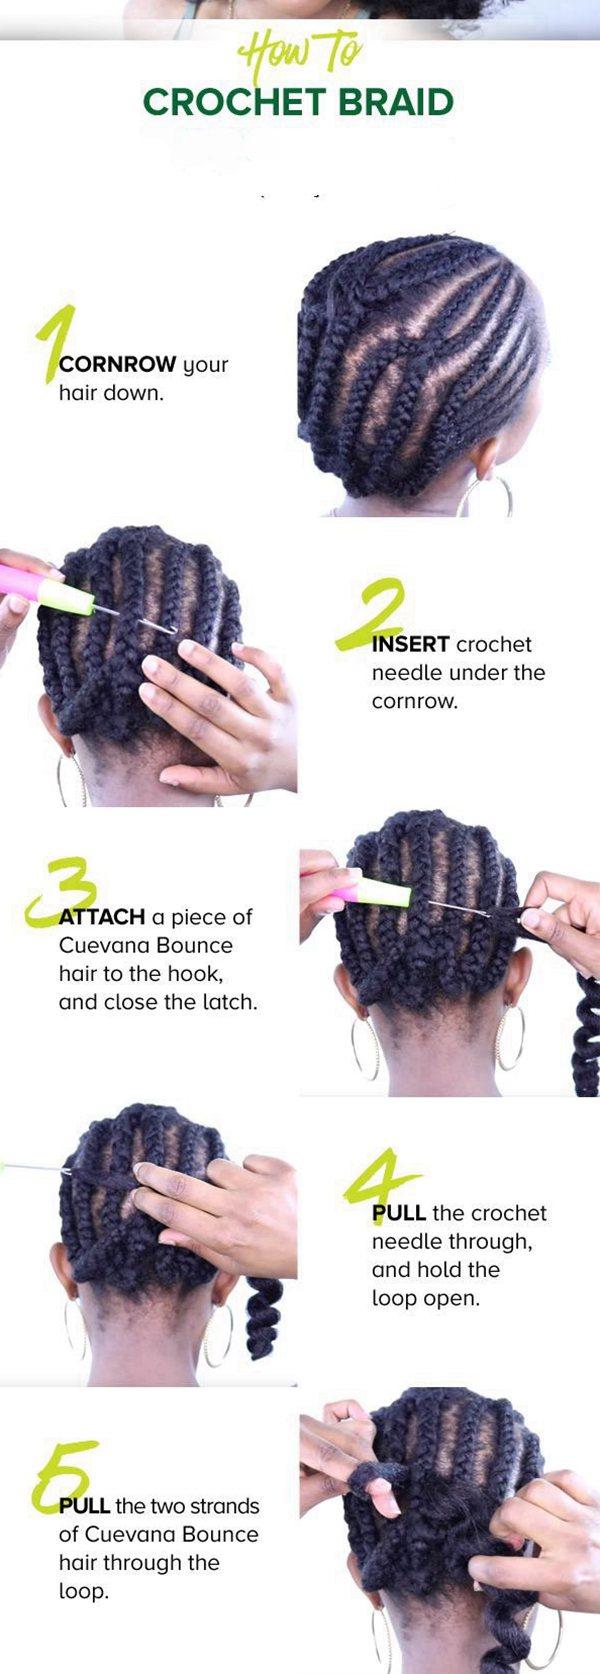 How to apply crochet hair